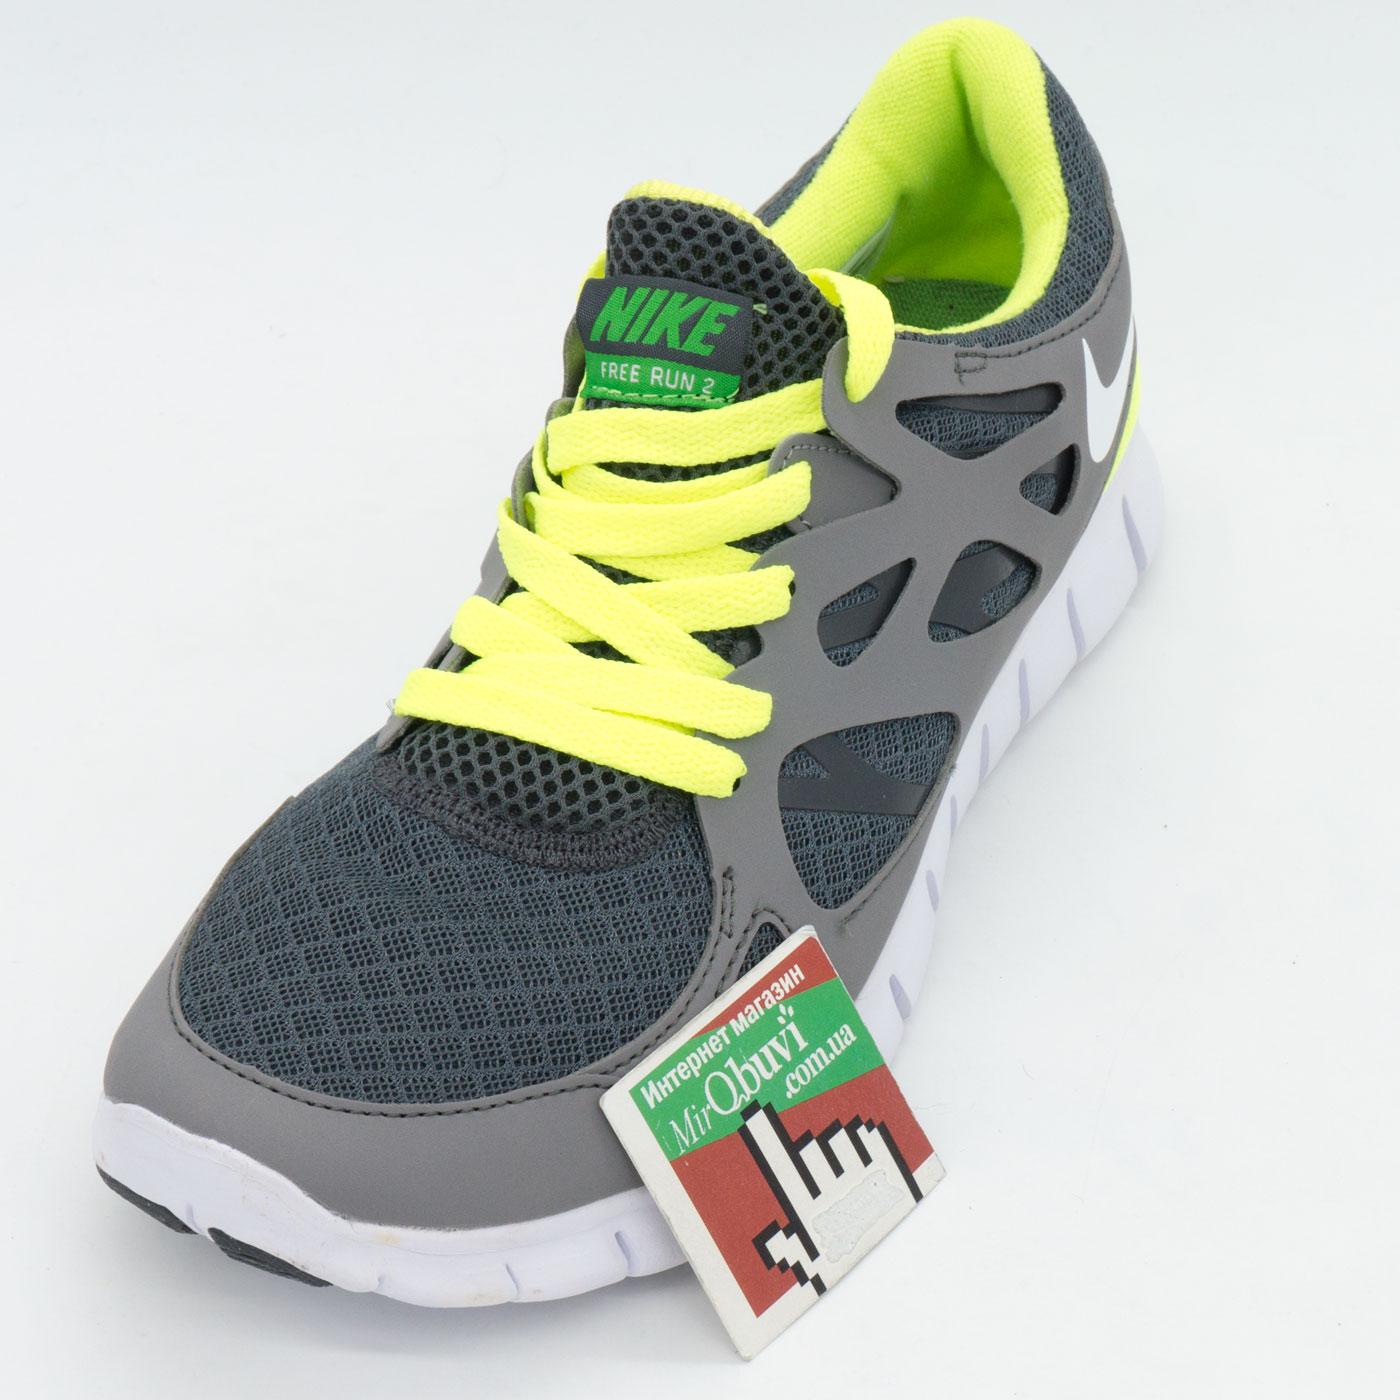 фото front Кроссовки для бега Nike Free Run 2 Найк Фри Ран, серо-зеленые front